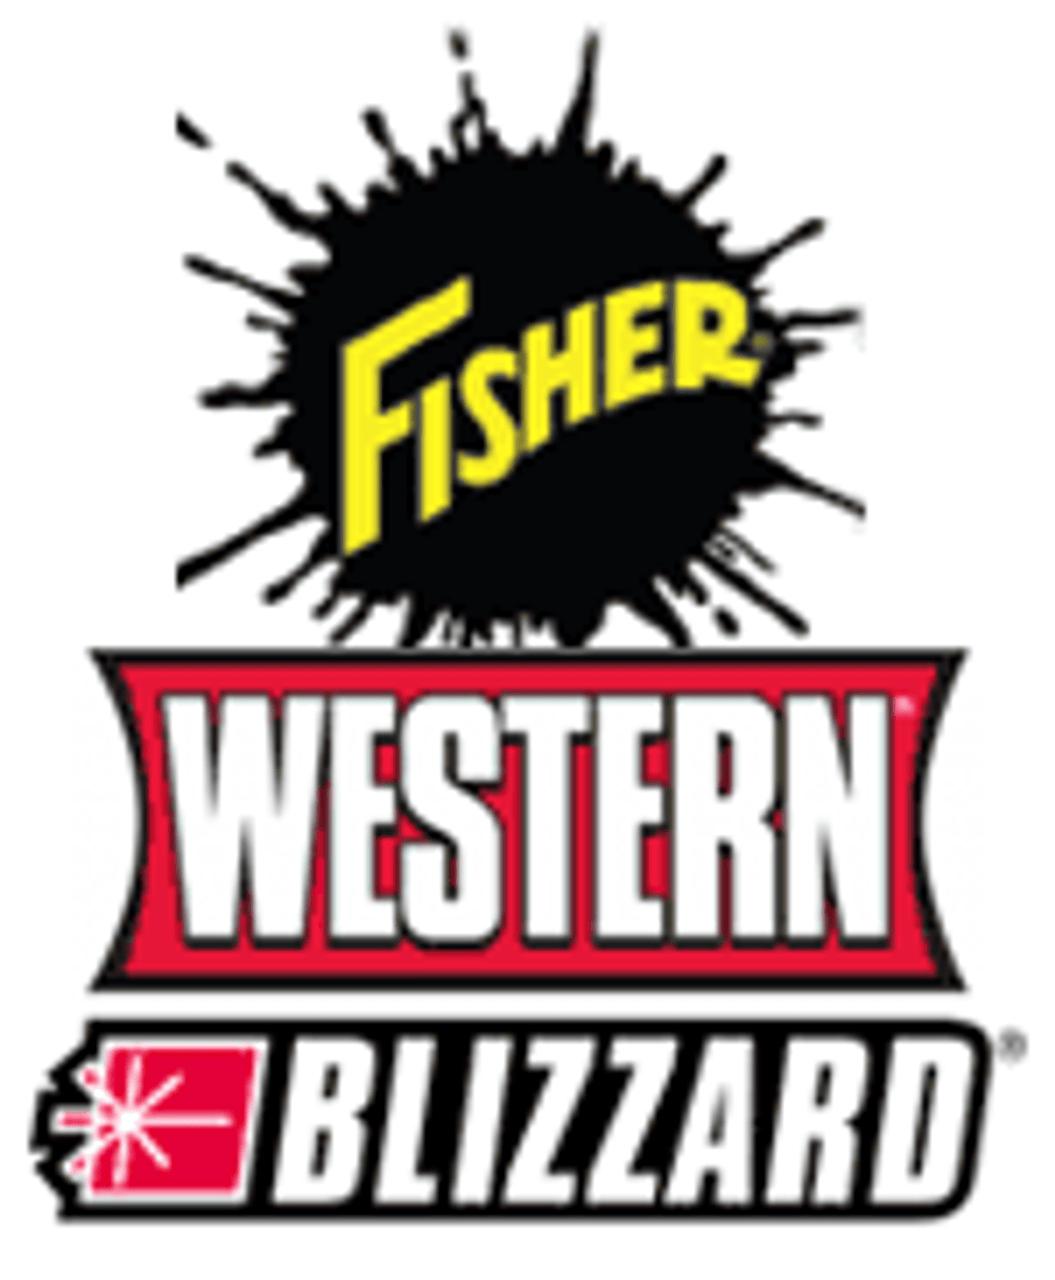 29049 - FISHER - WESTERN -  BLIZZARD - SNOWEX   PLUG-IN HARNESS KIT H13